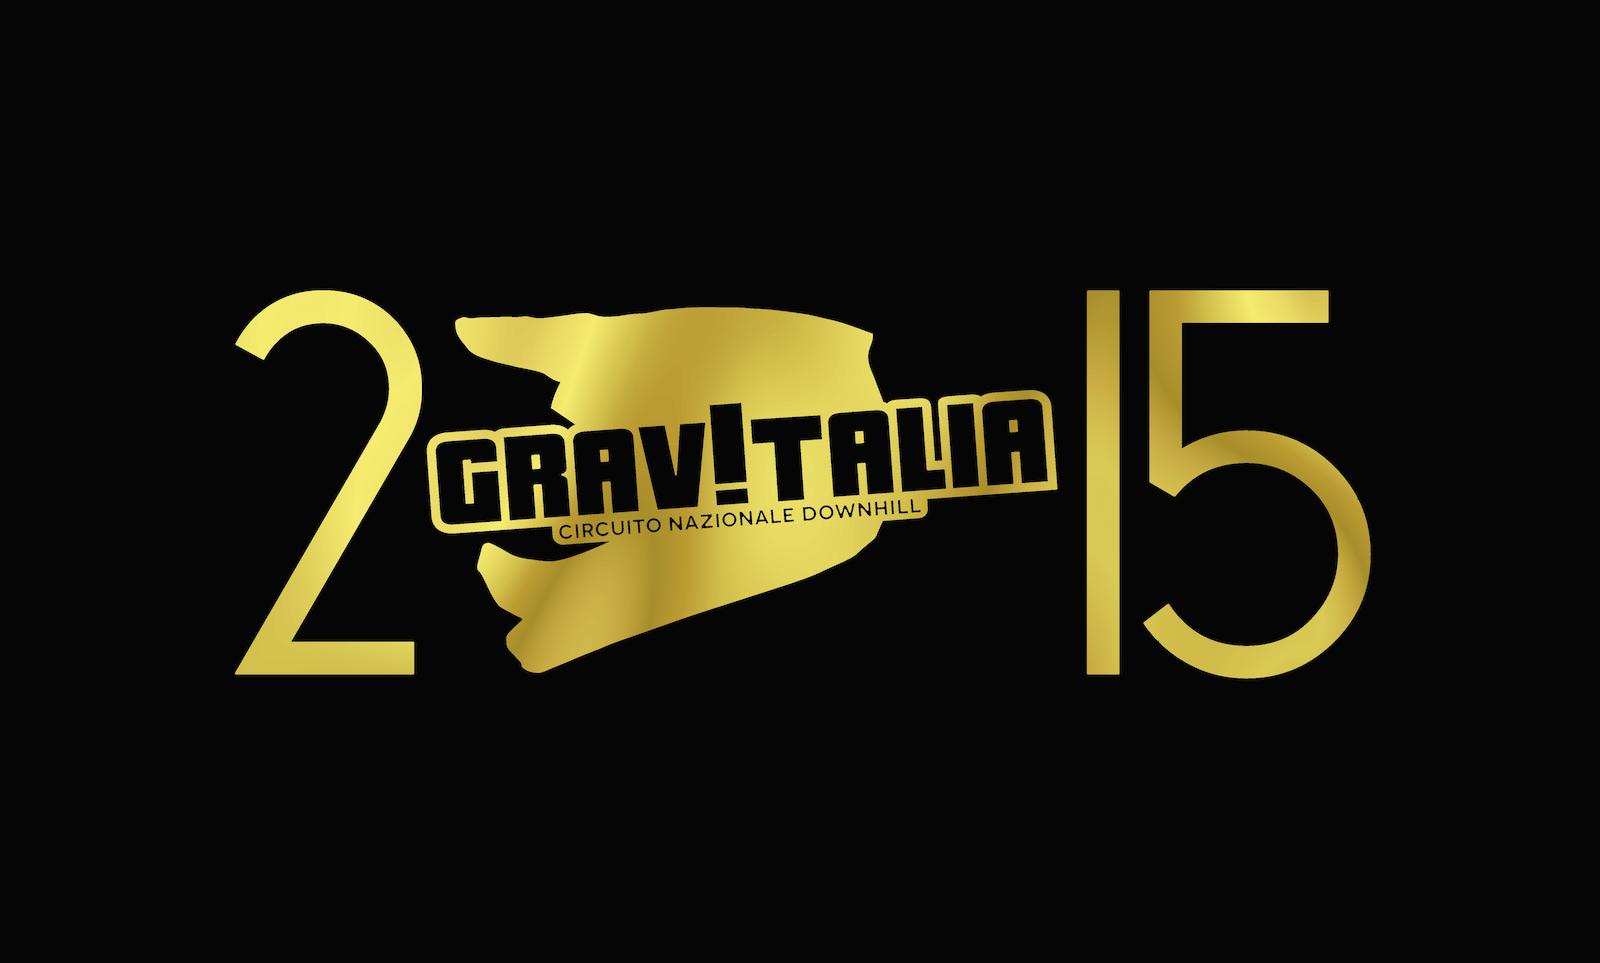 gravitalia_2015